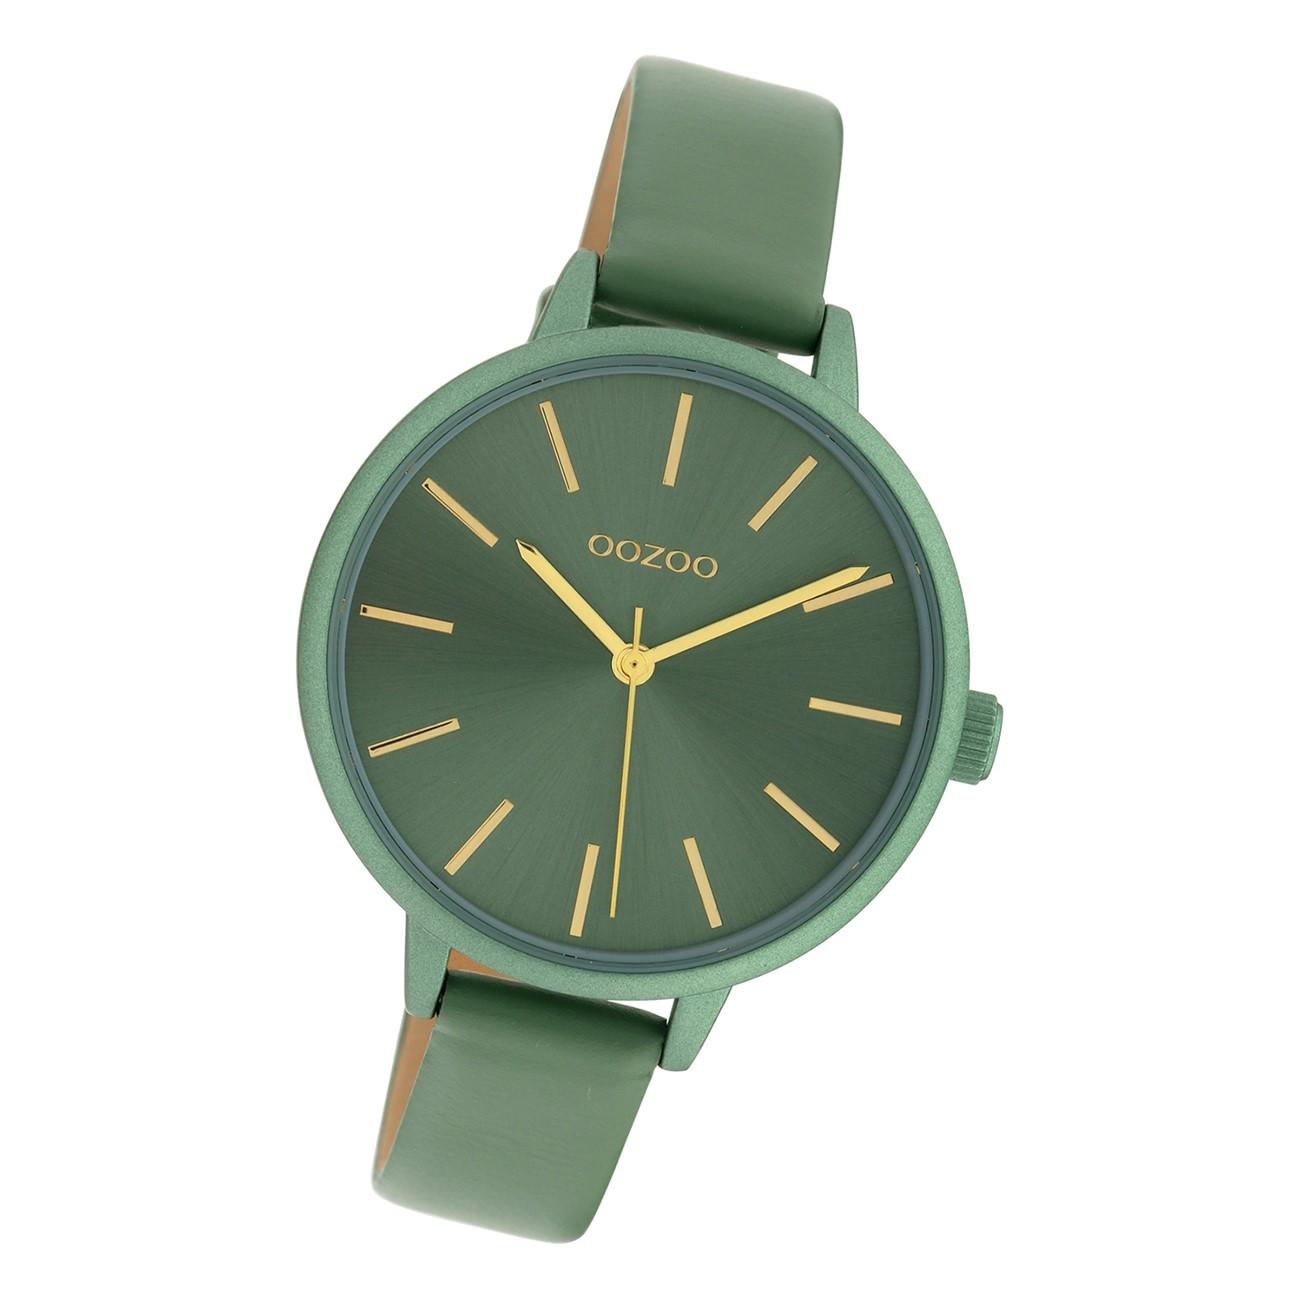 Oozoo Damen Armbanduhr Timepieces C10255 Analog Leder hellgrün UOC10255